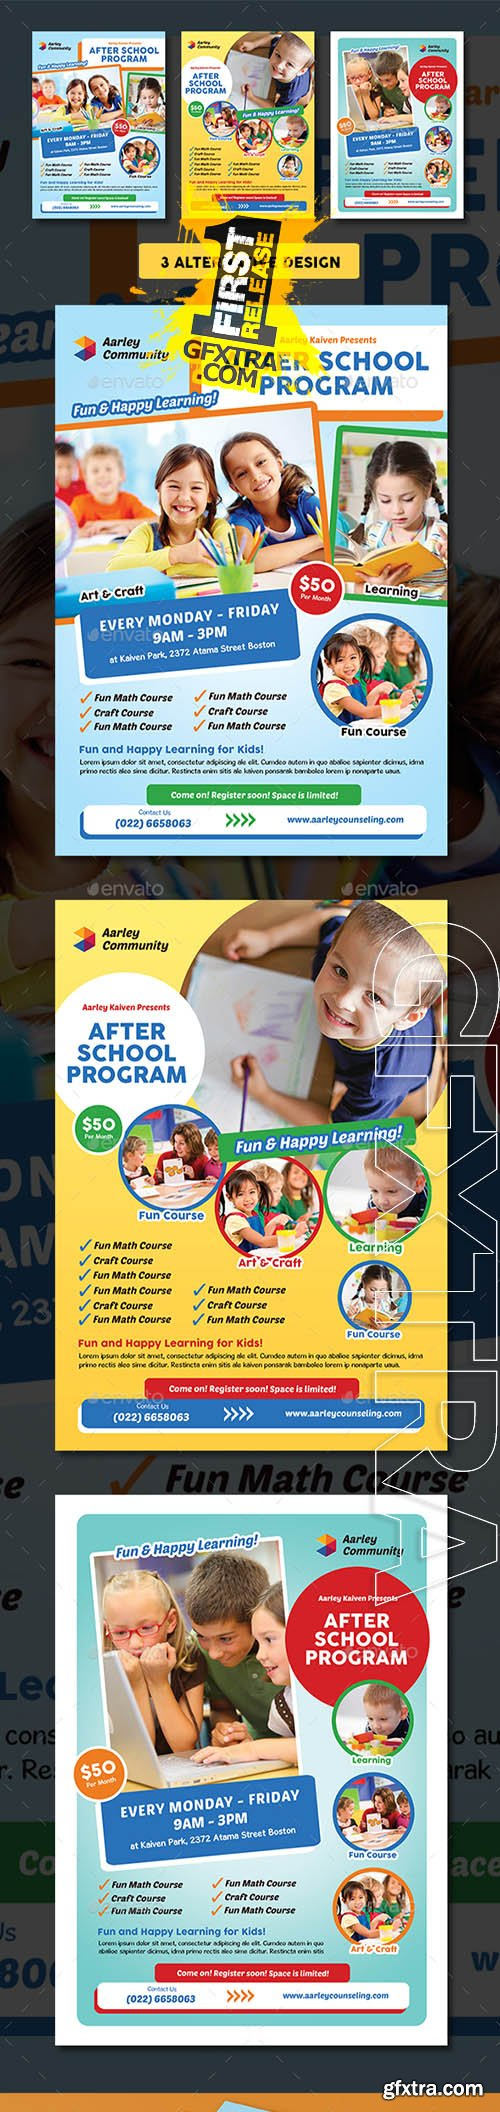 After School Program Flyer 18411159